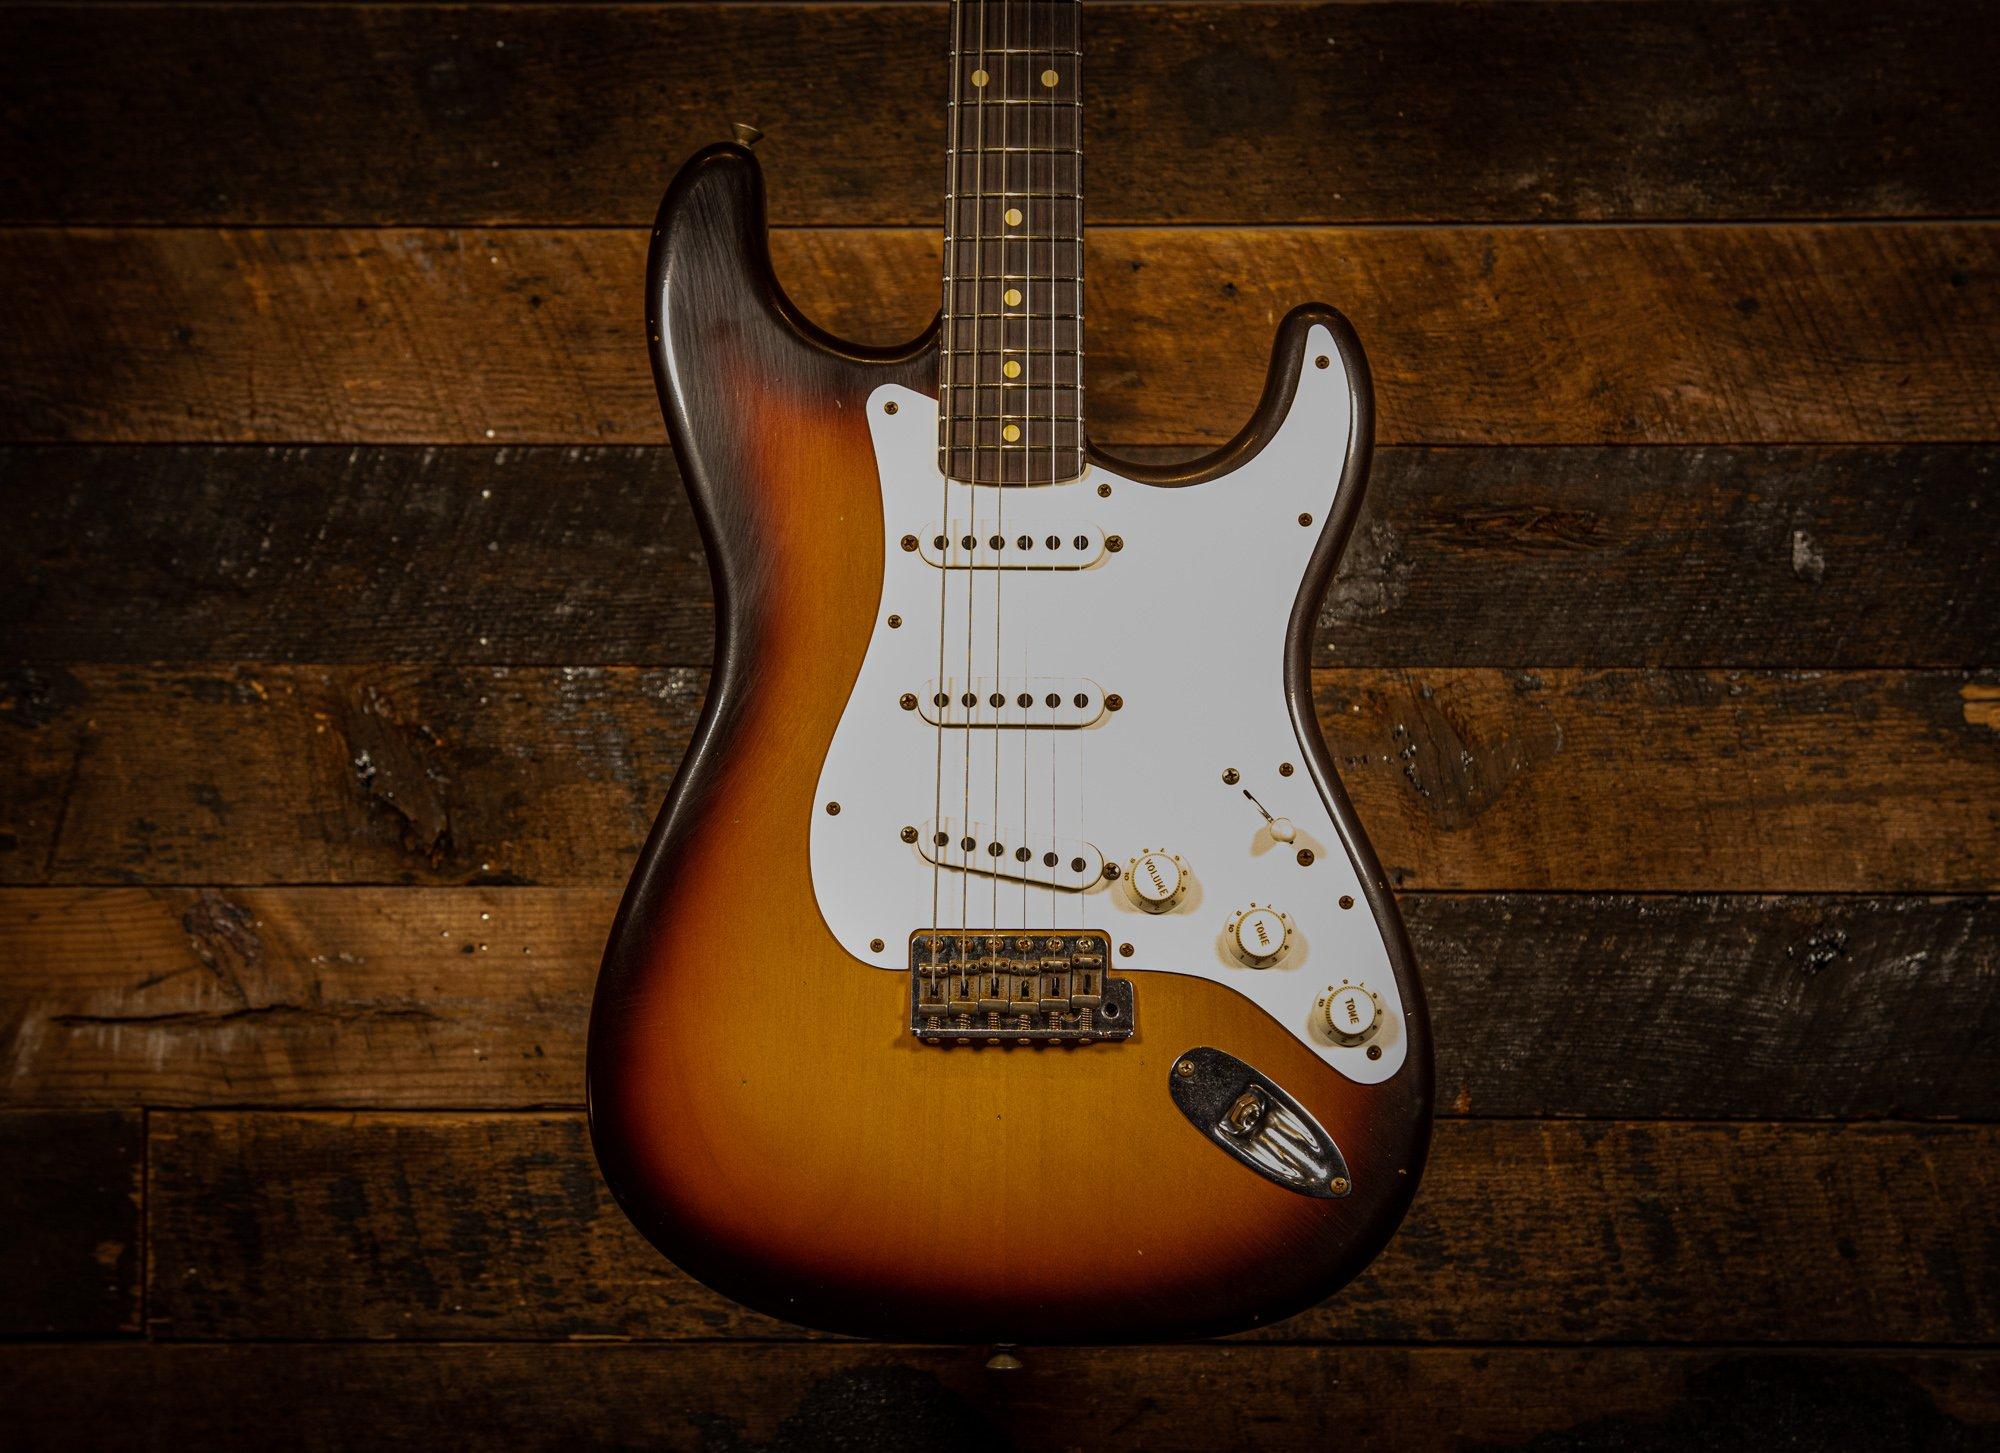 Fender Custom Shop 1959 Stratocaster Journeyman relic in Flashcoat Faded Aged Chocolate 3-tone Sunburst